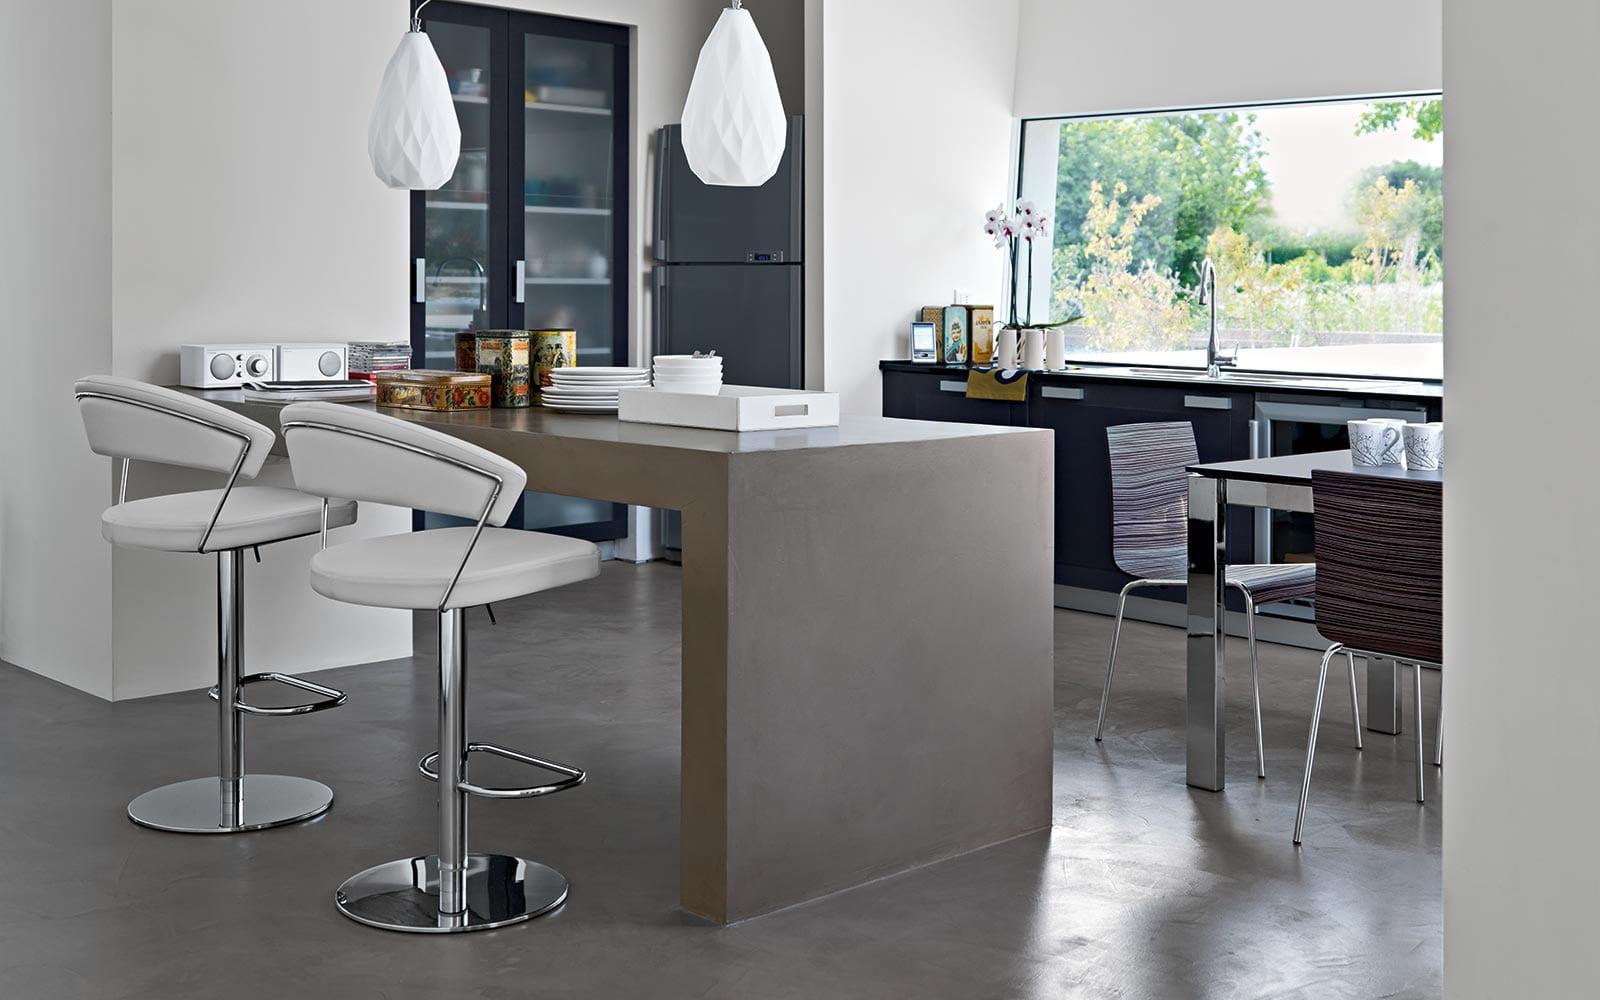 Calligaris tavoli e sedie - Lube tavoli e sedie prezzi ...